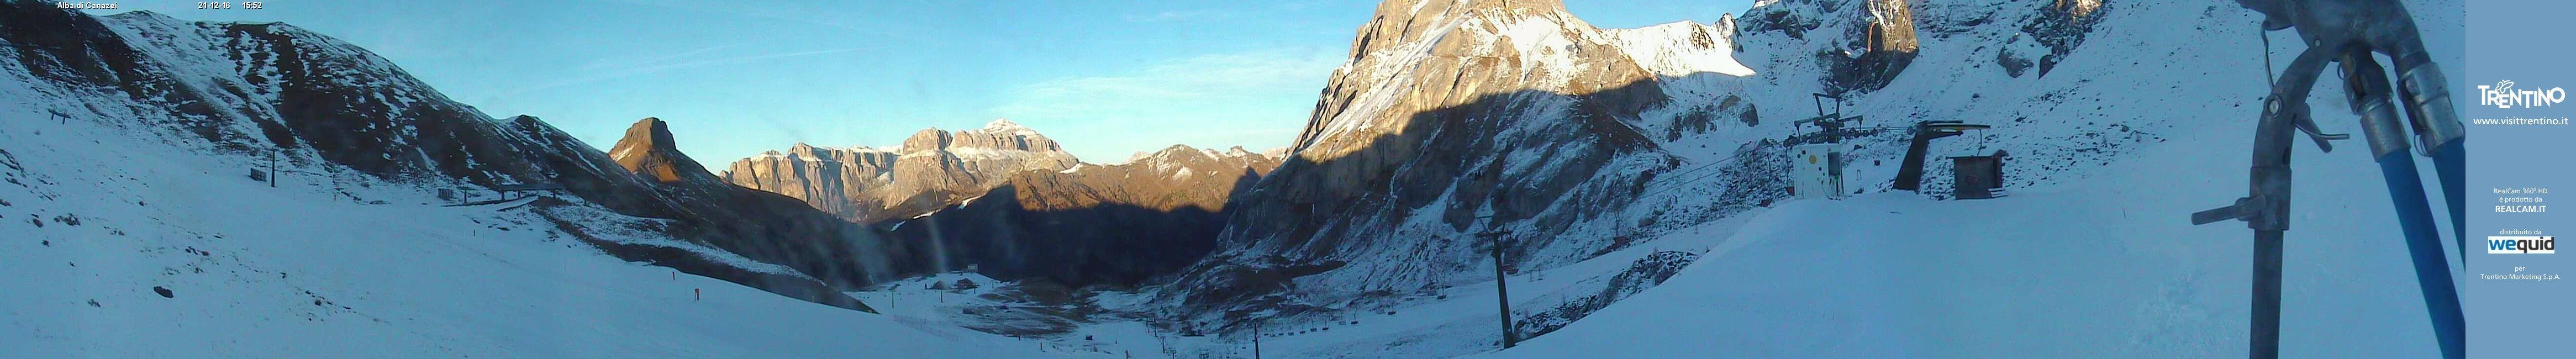 Webcam <br><span> alba di canazei ciampac</span>